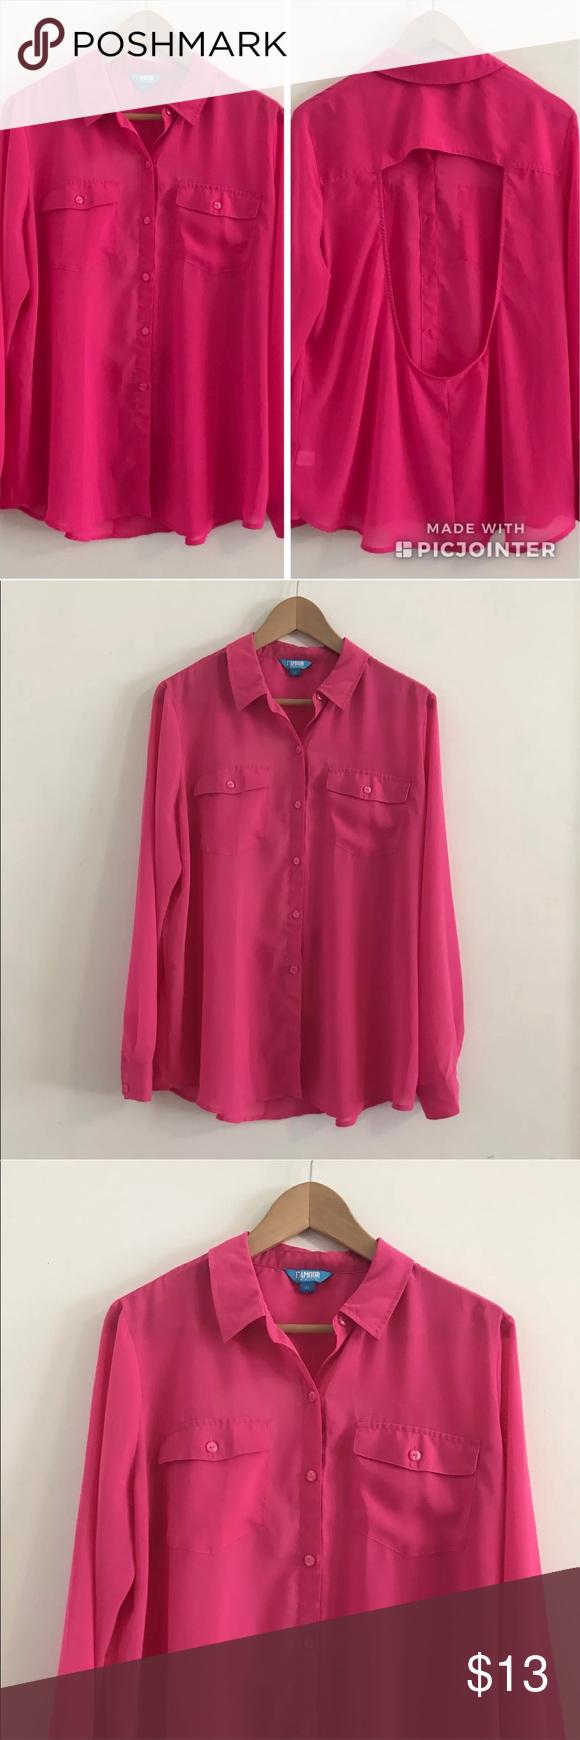 L Amore Pink Top Blouse Shirt Open Back Size Xl My Posh Picks